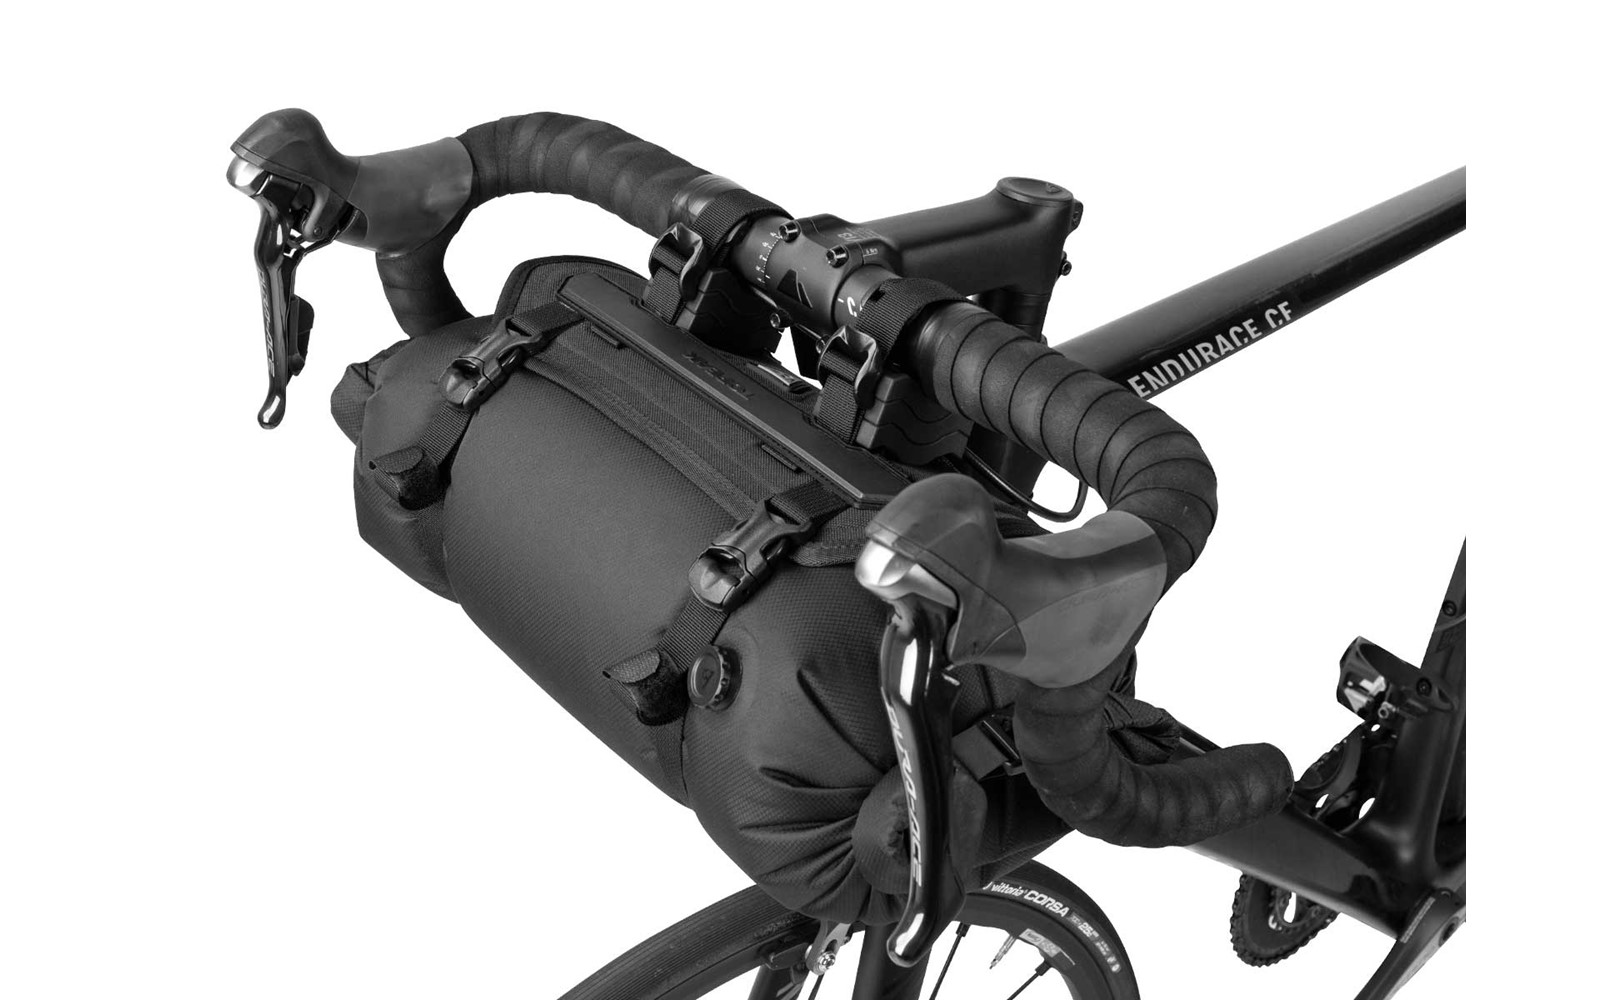 Велосумка на руль Topeak FrontLoader чёрная за 1899900 руб.